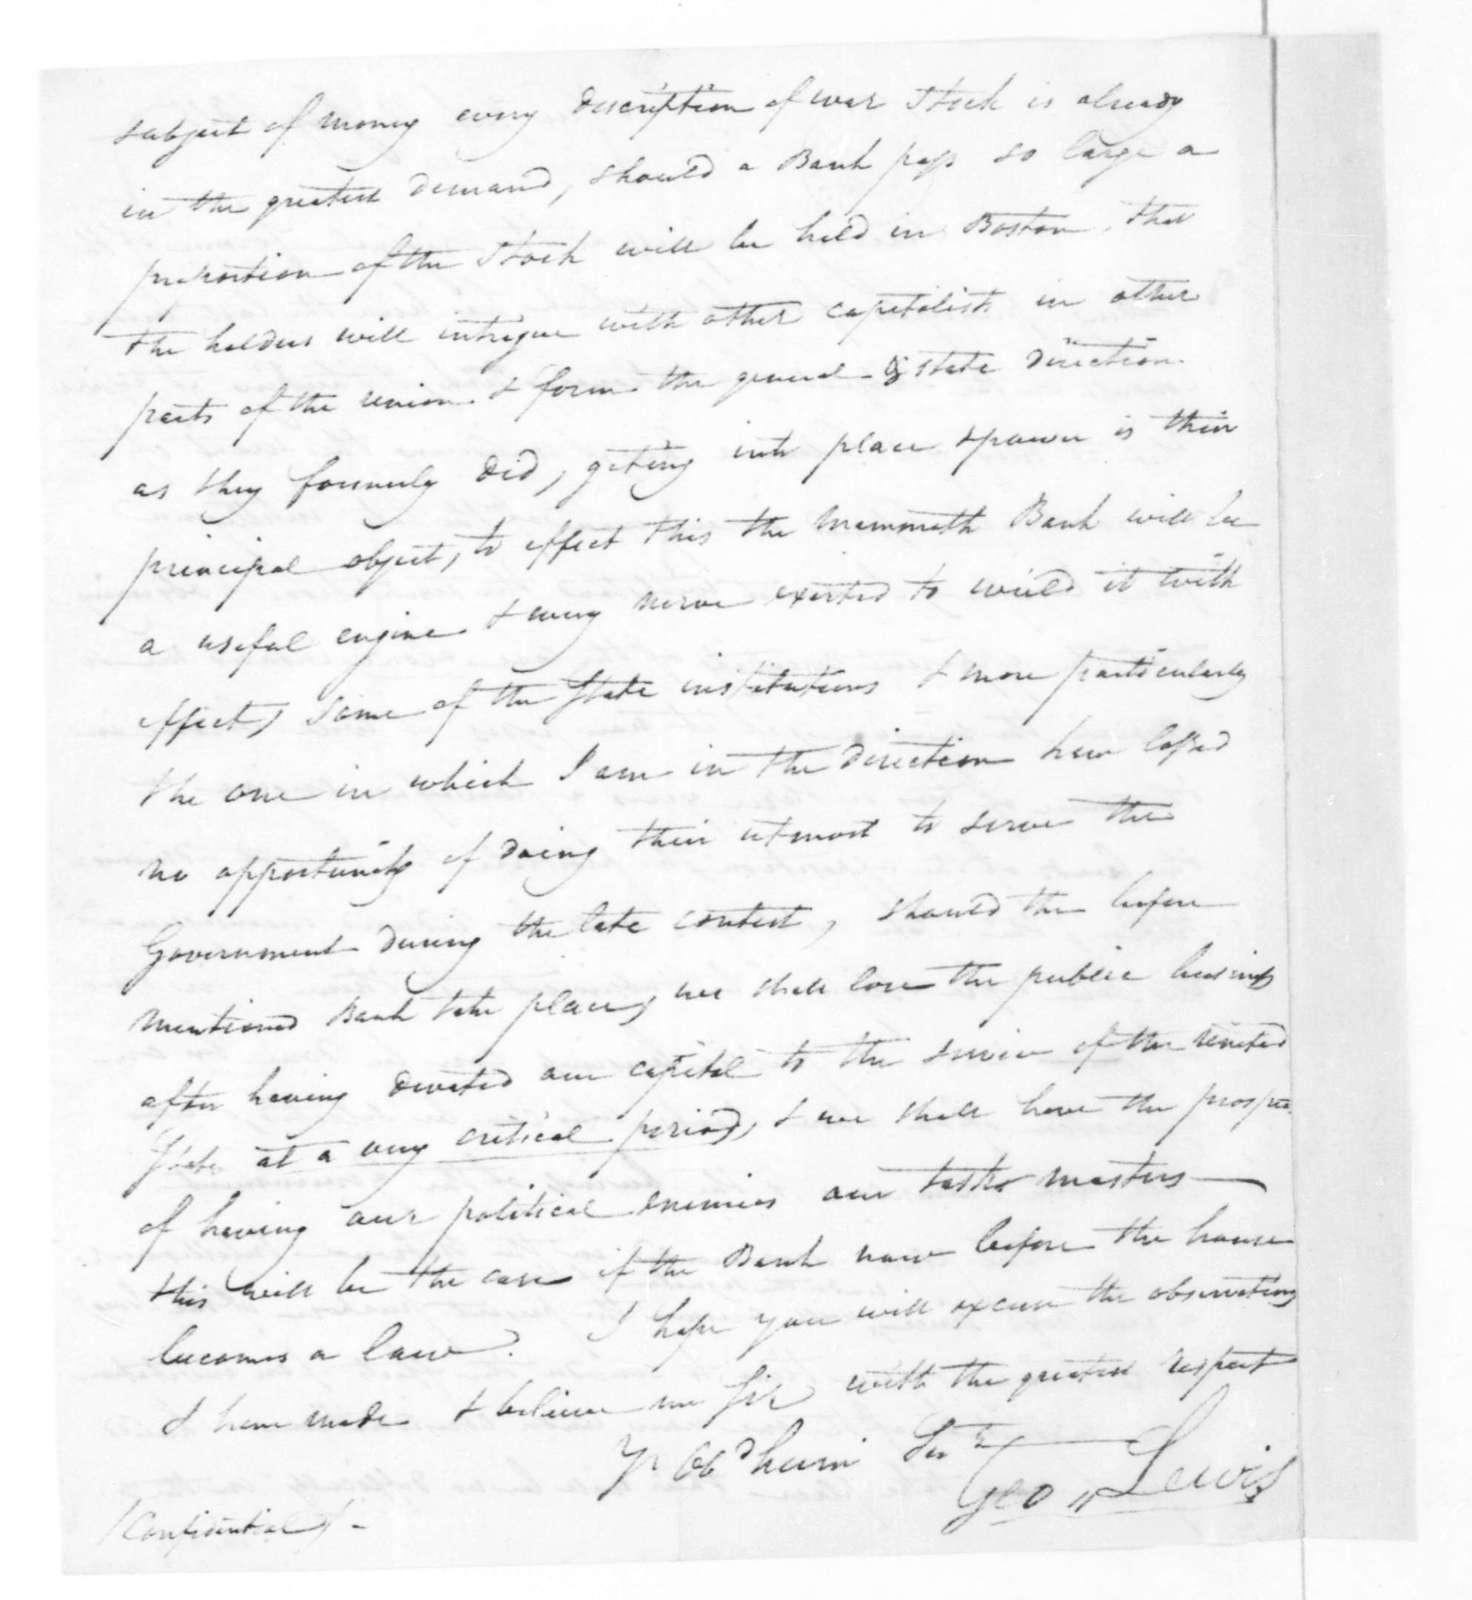 George Lewis to James Madison, February 14, 1815.